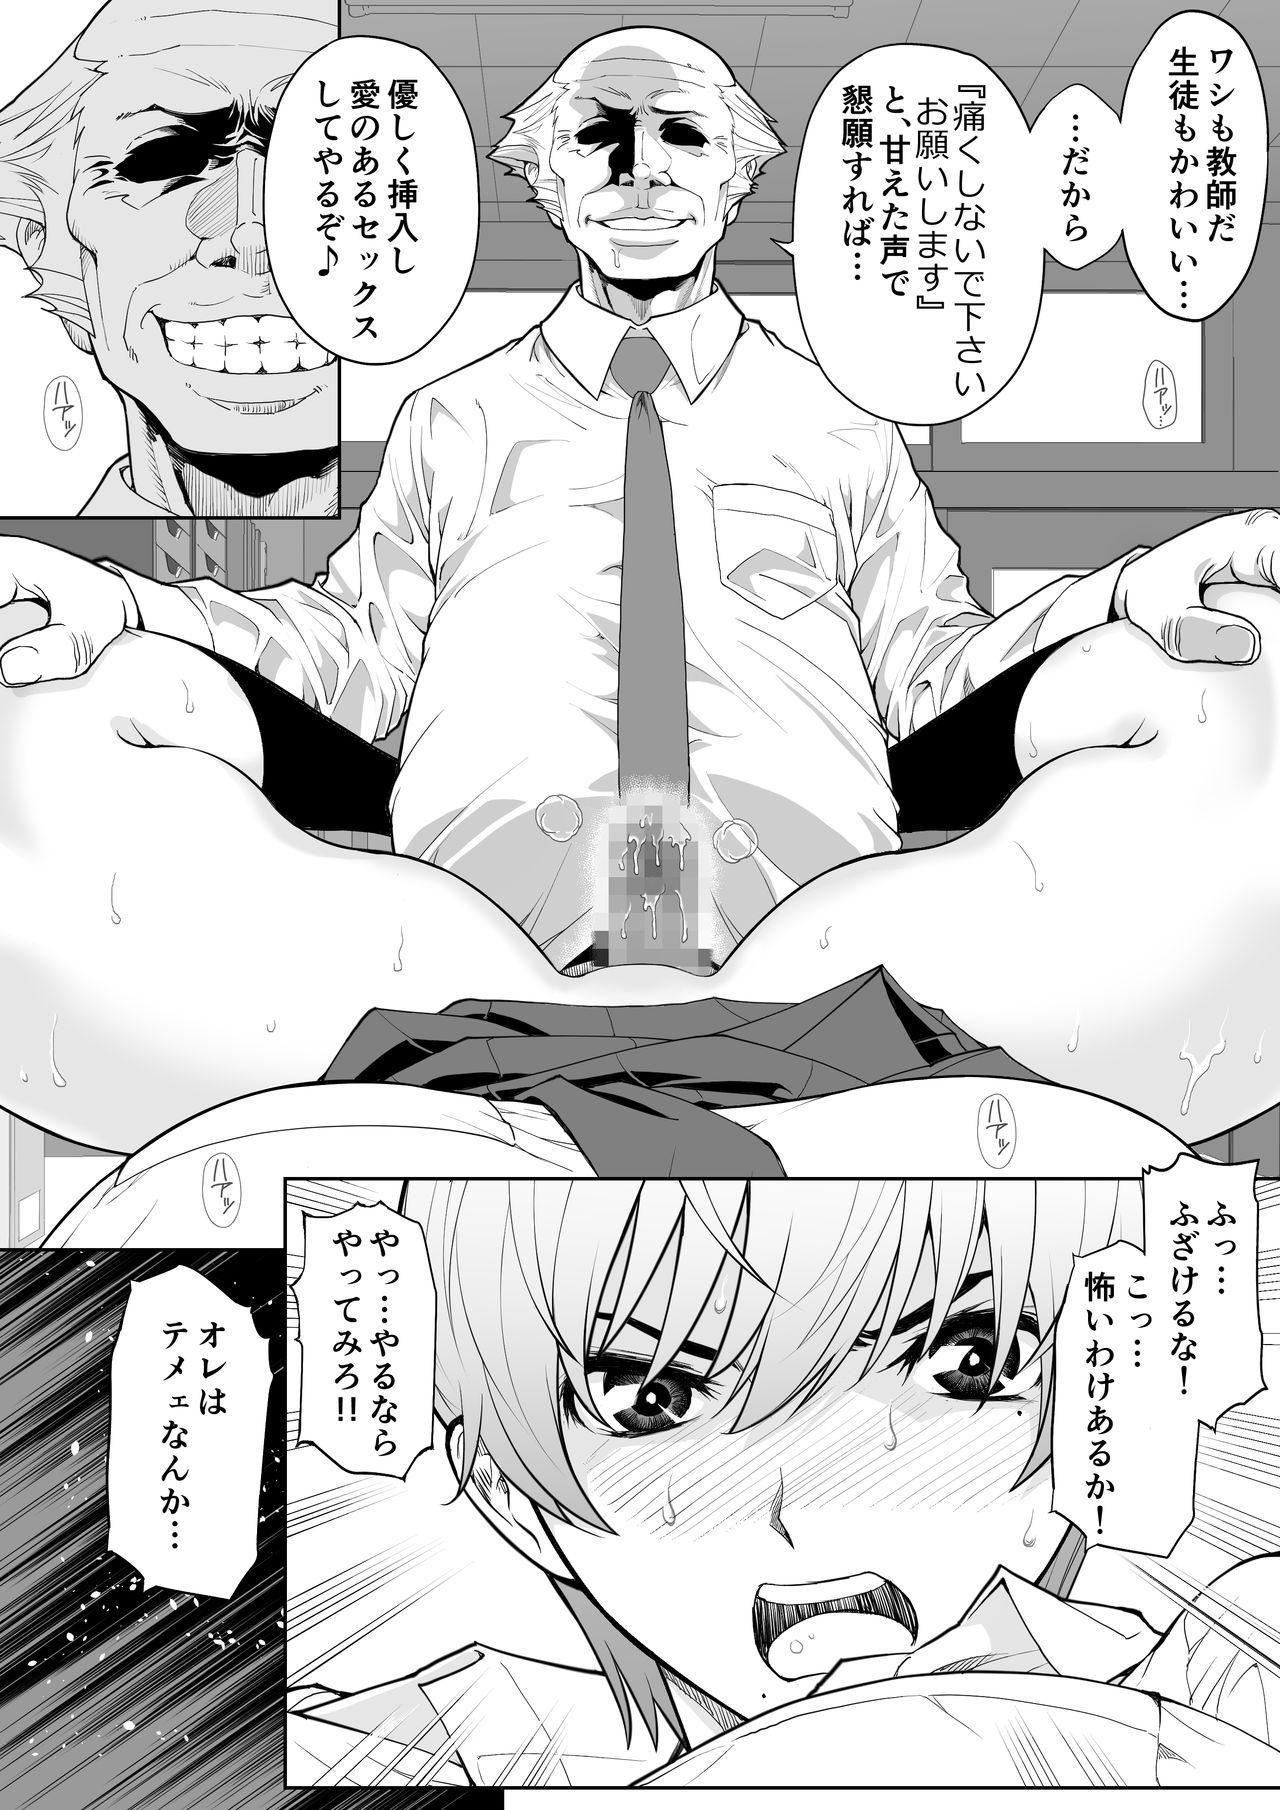 Namaiki mmusume ni tsuyo ● ikīki jugyō 40